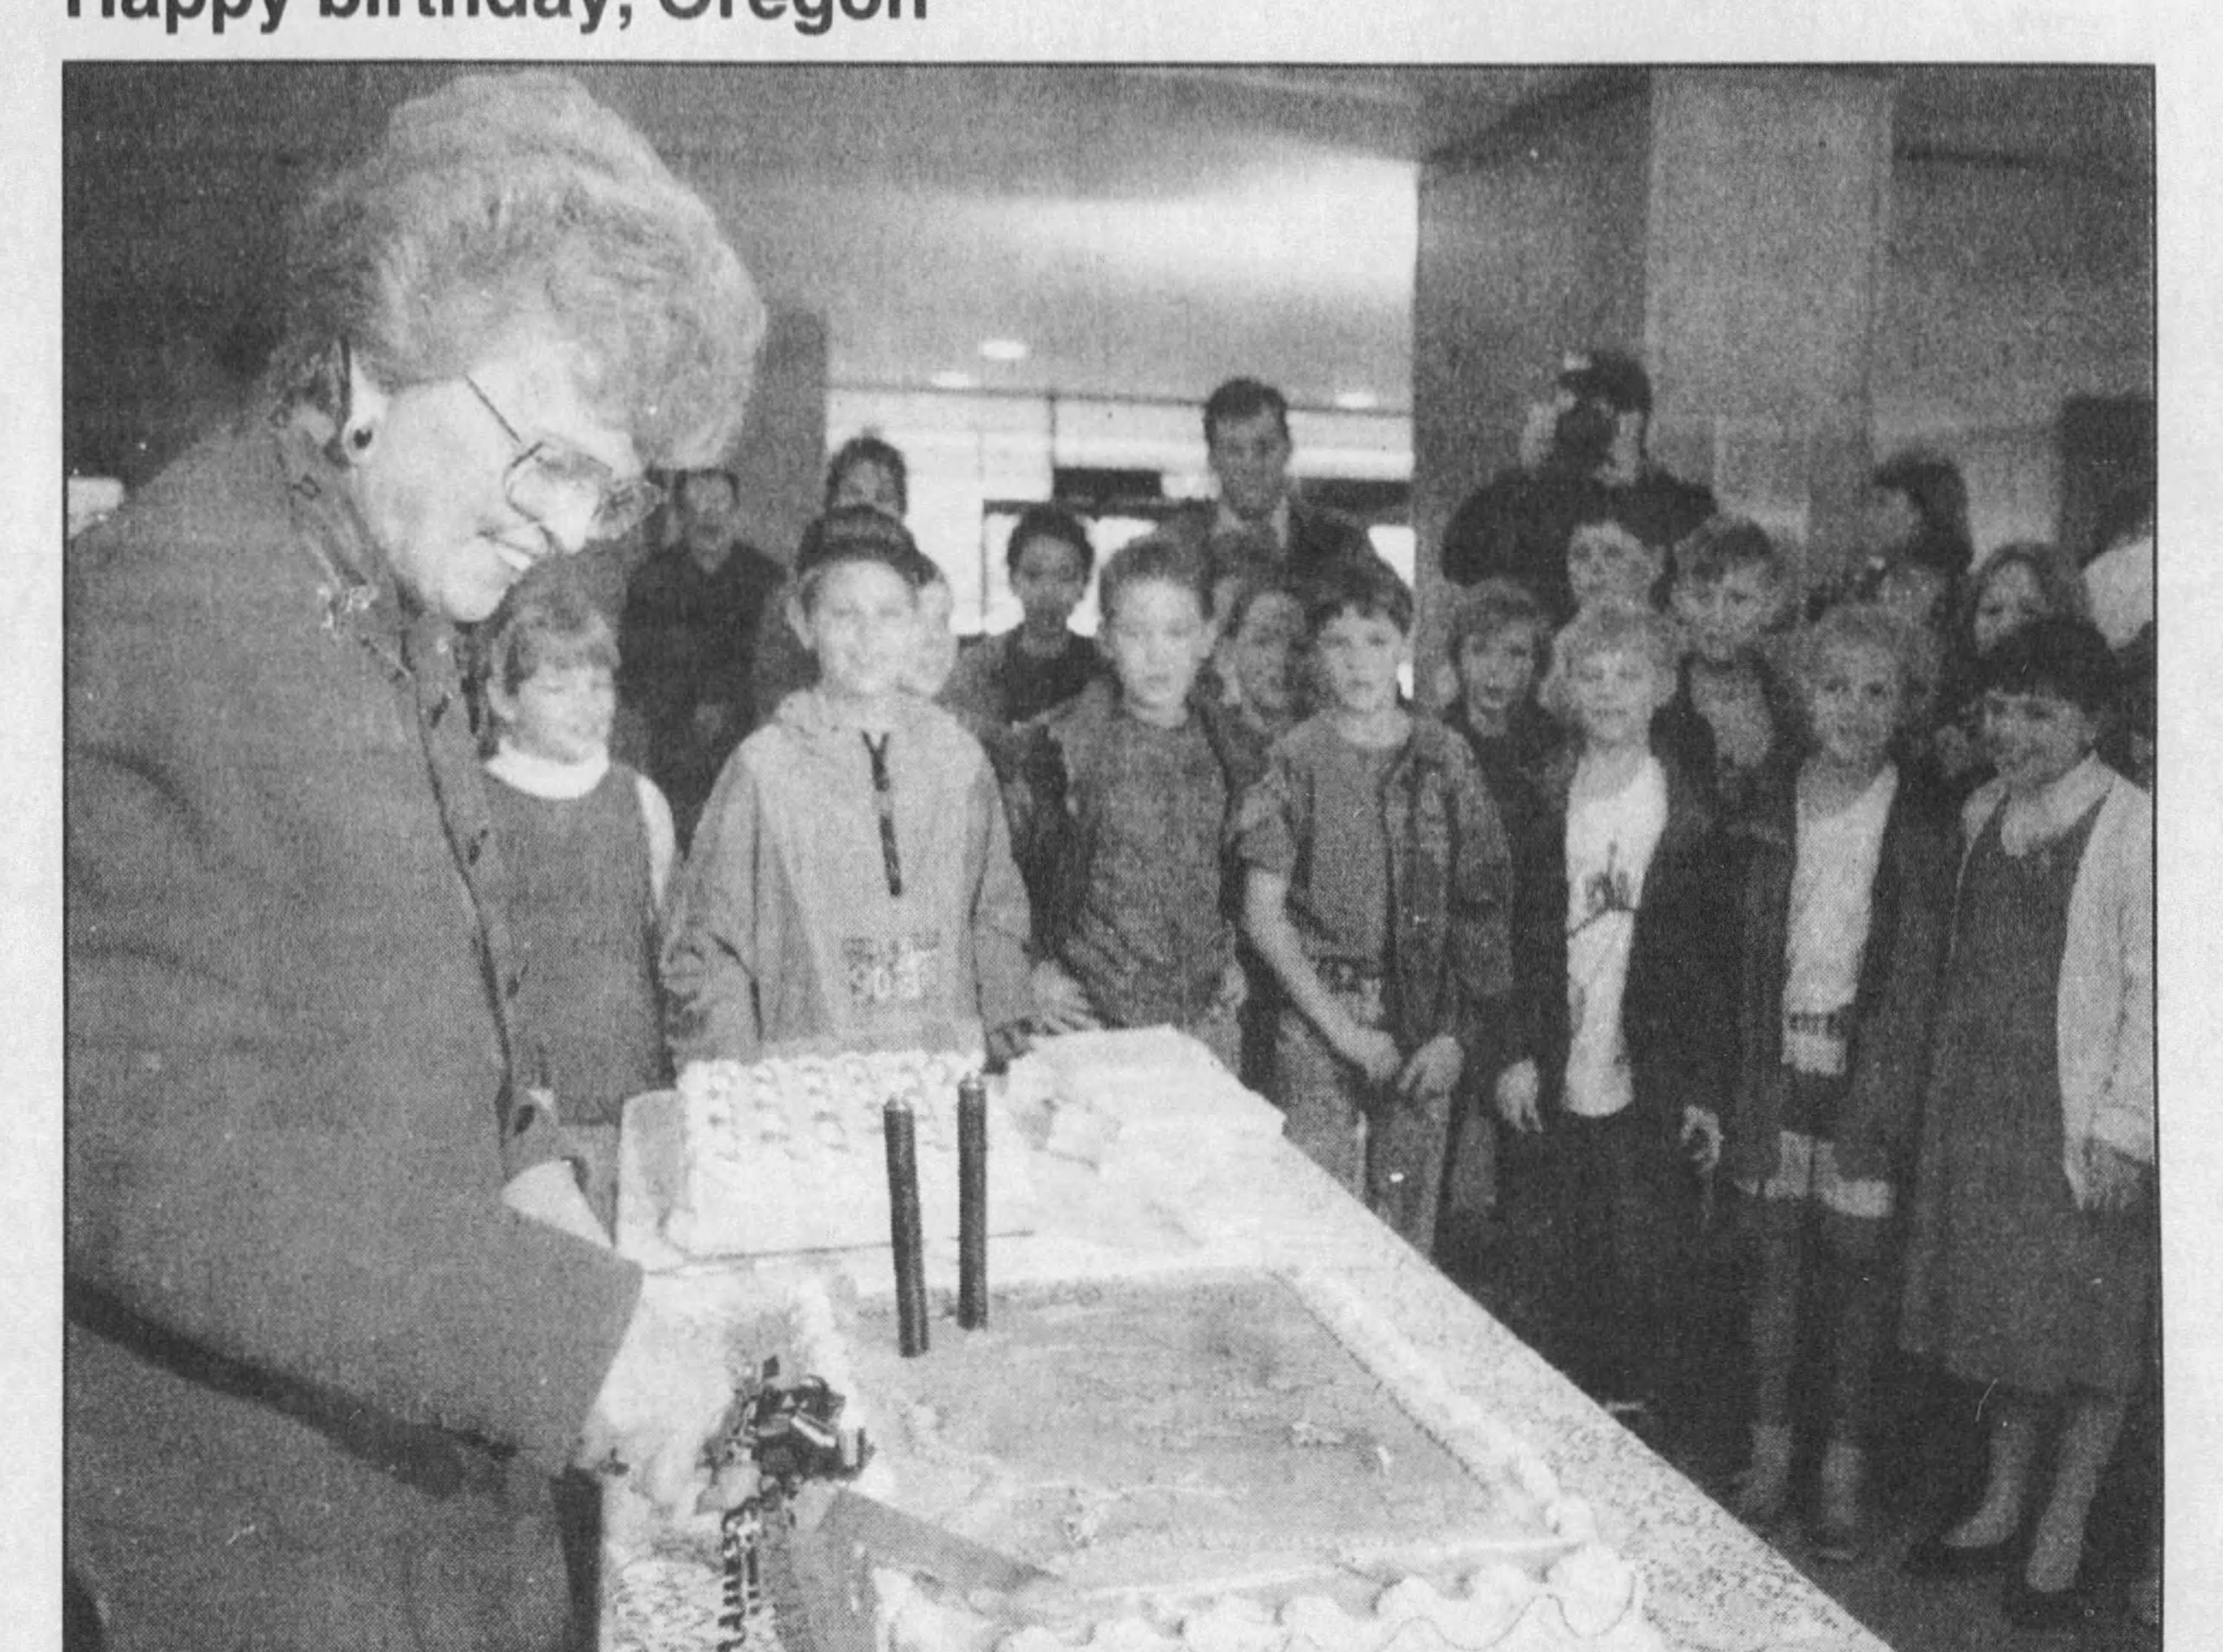 Gov. Barbara Roberts slices the cake on Oregon's 133rd birthday in 1992.